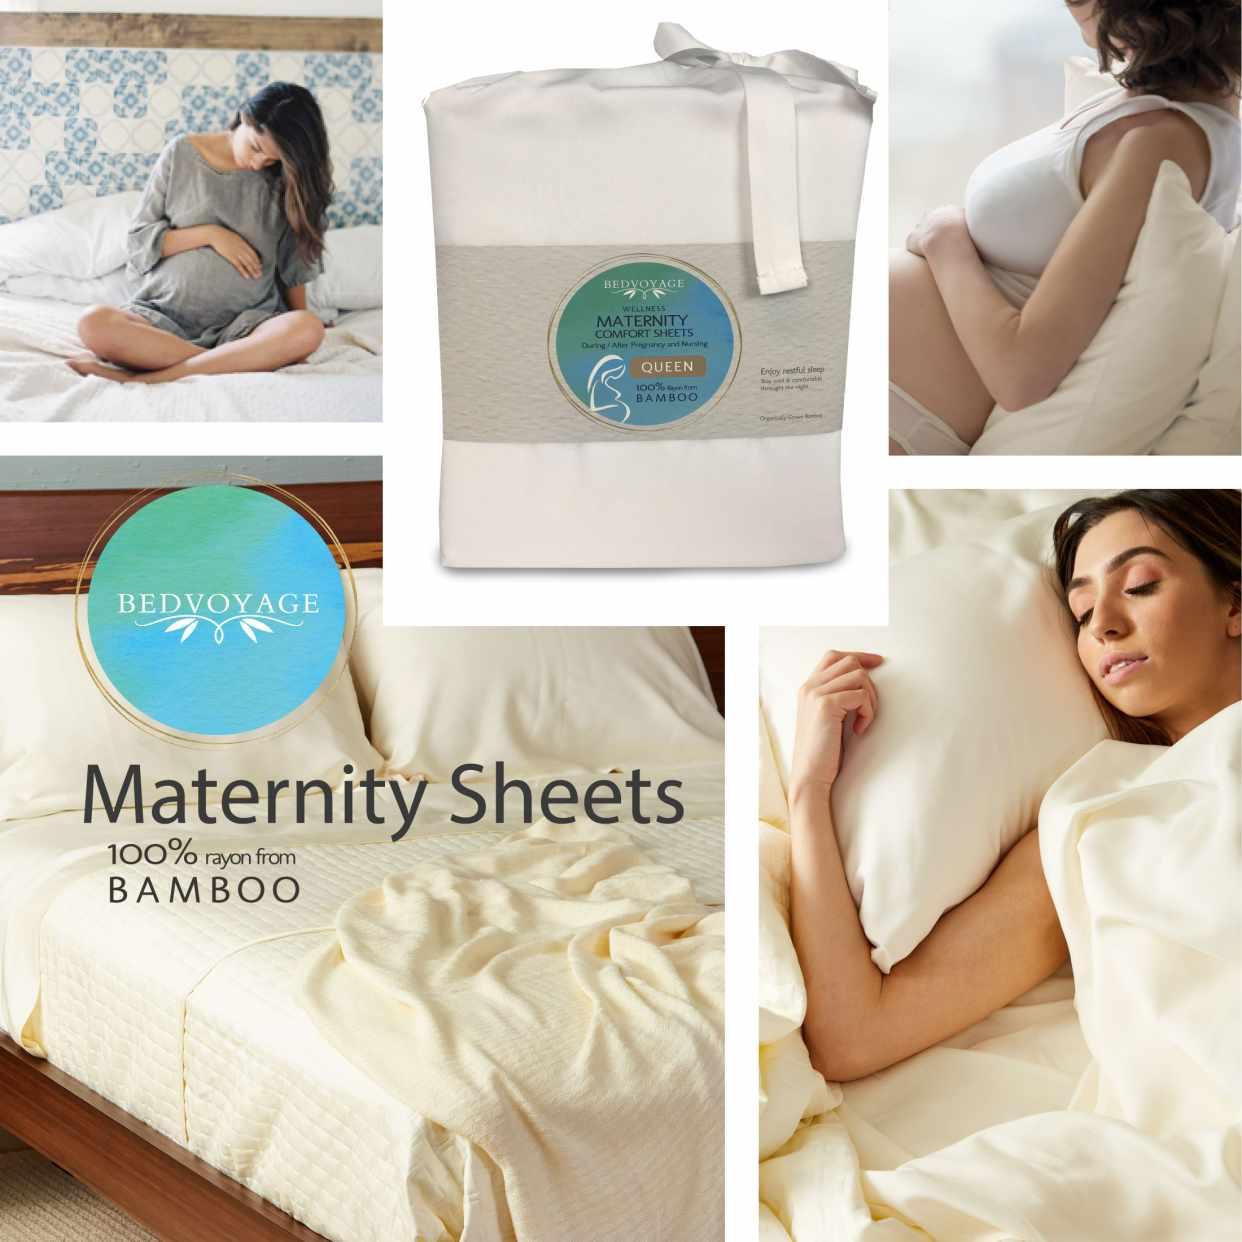 BedVoyage_MaternitySheets_PressRelease2019